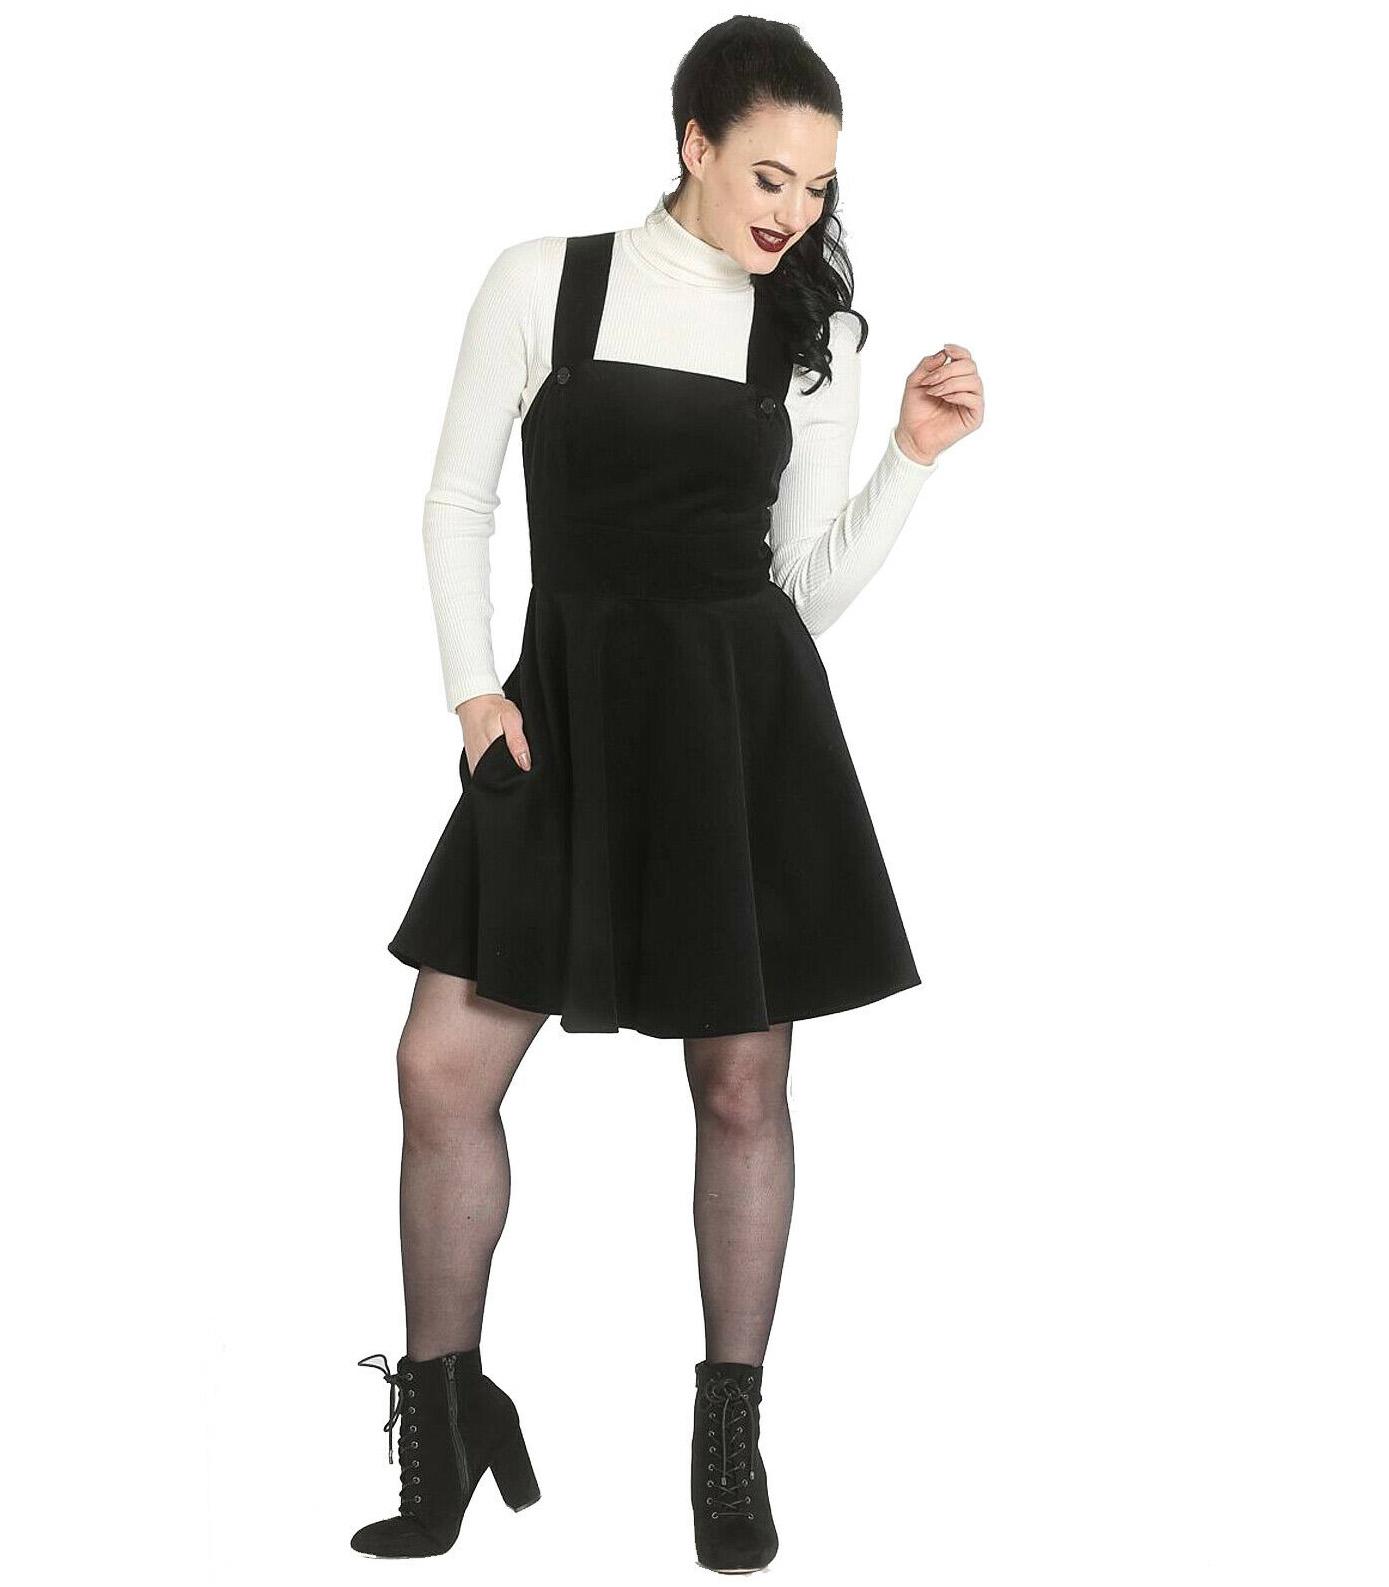 Hell-Bunny-Rockabilly-Corduroy-Mini-Dress-WONDER-YEARS-Pinafore-Black-All-Sizes thumbnail 15